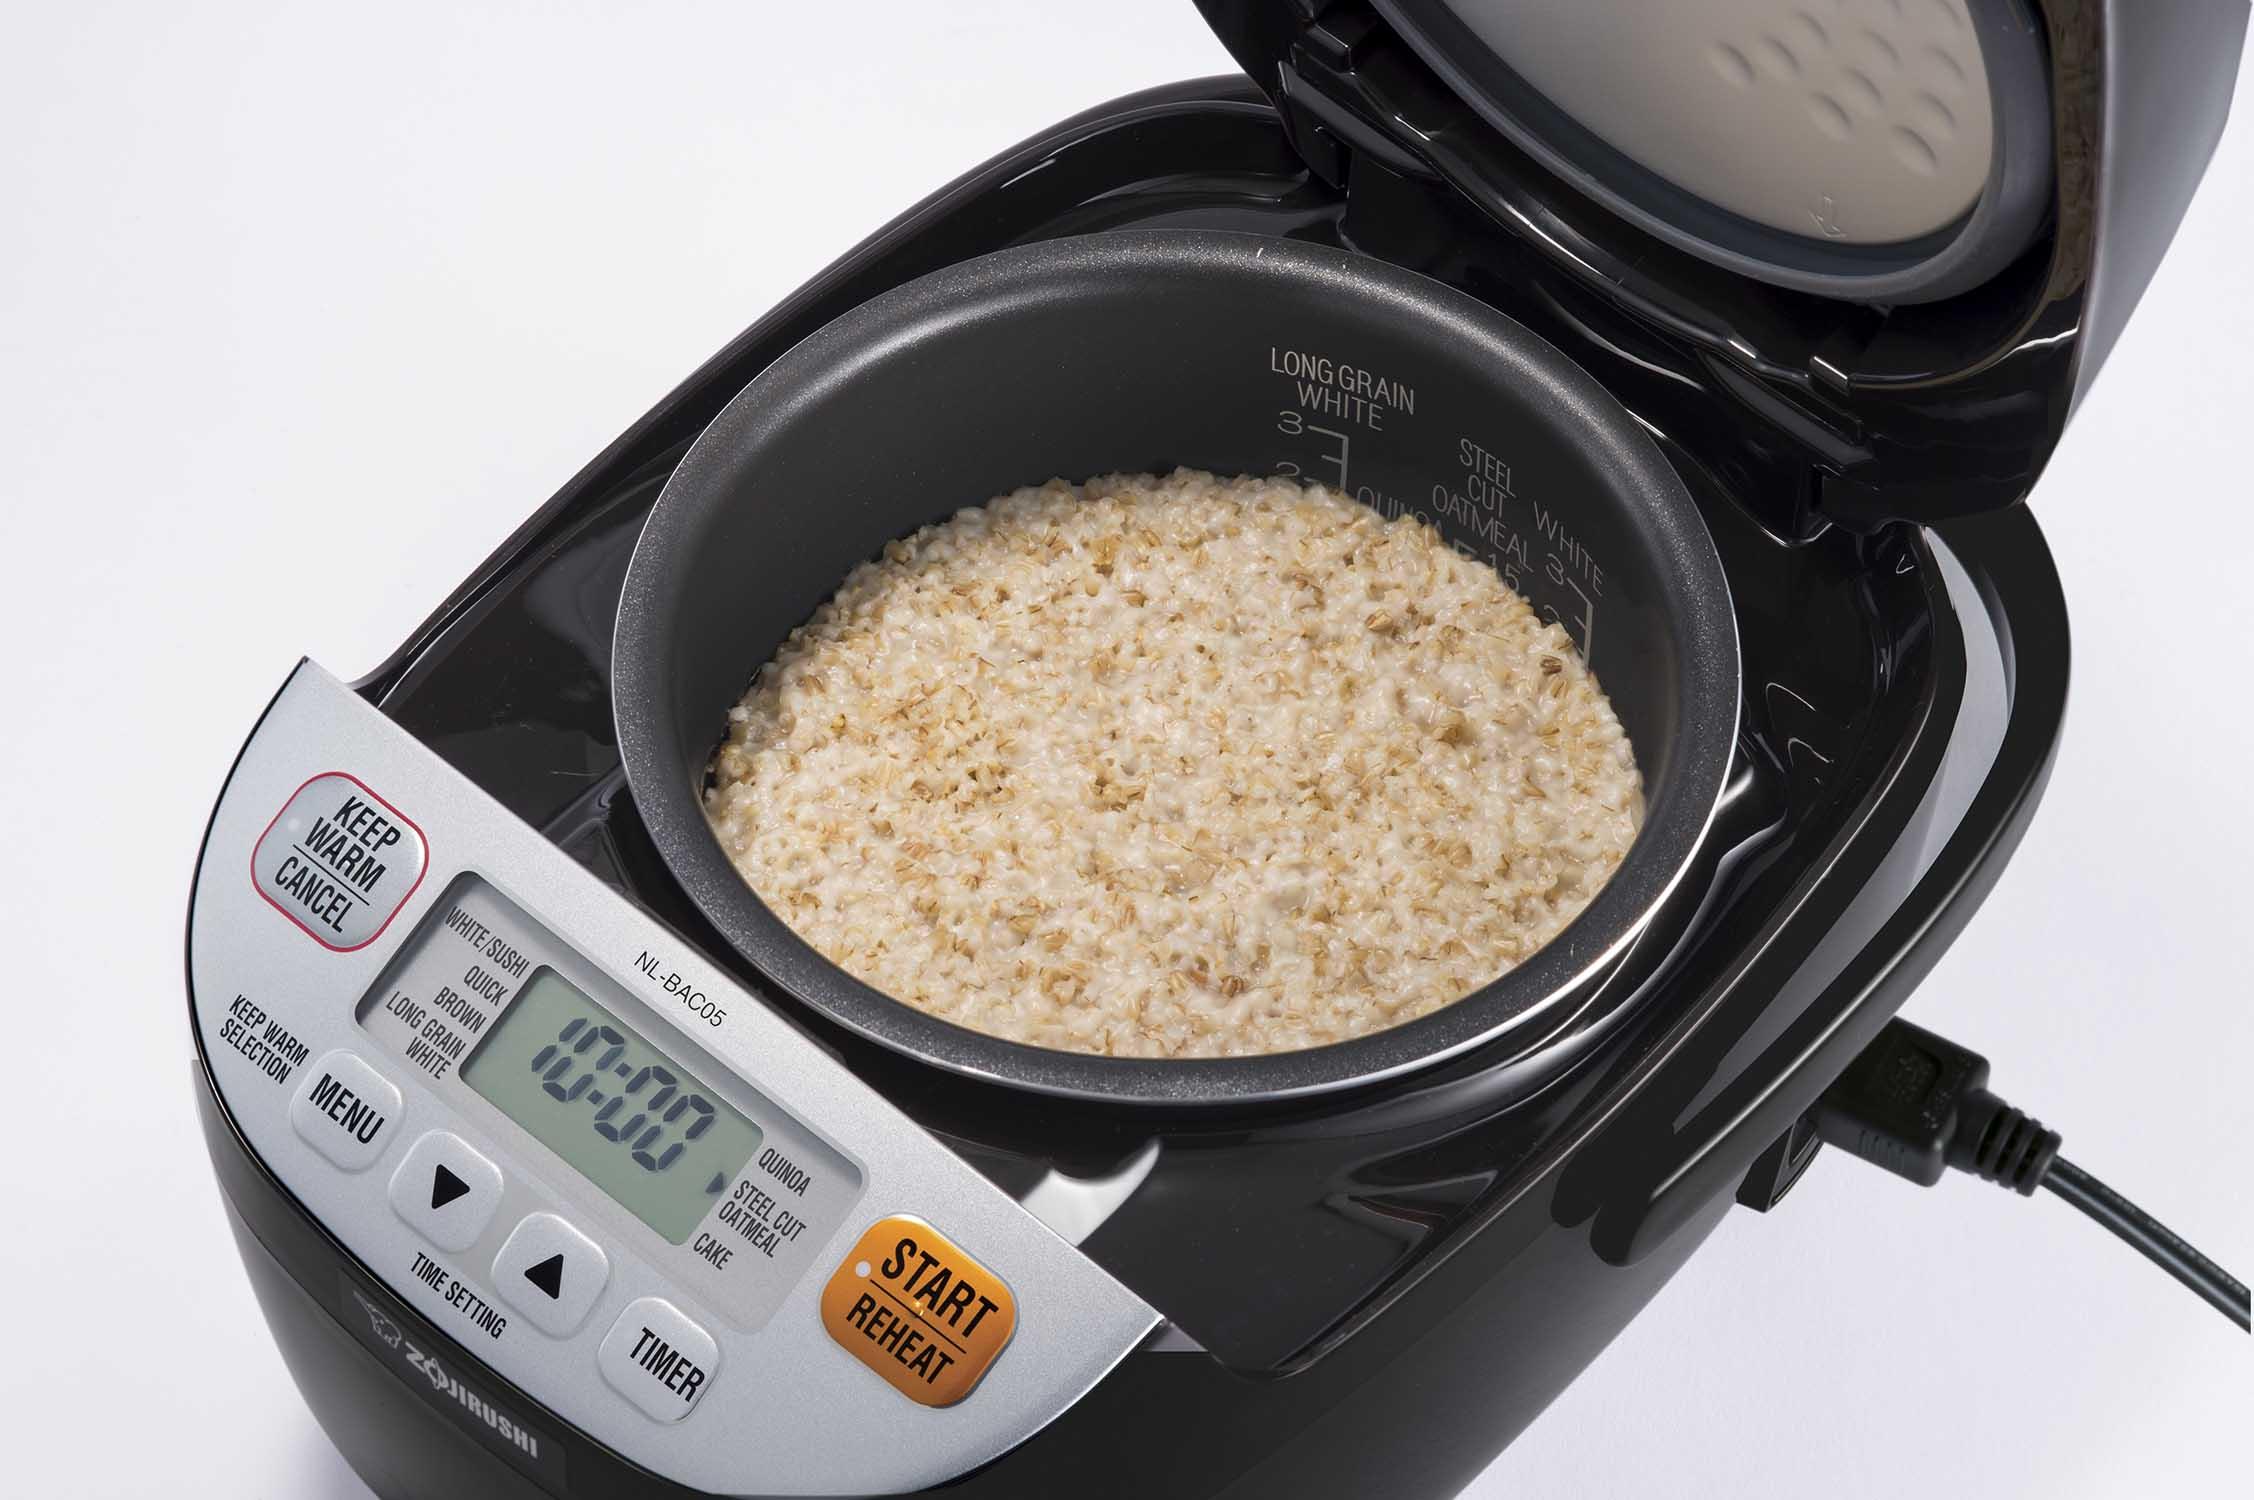 Zojirushi Rice Cooker with Steel Cut Oatmeal Quinoa Setting – Invite Fitness